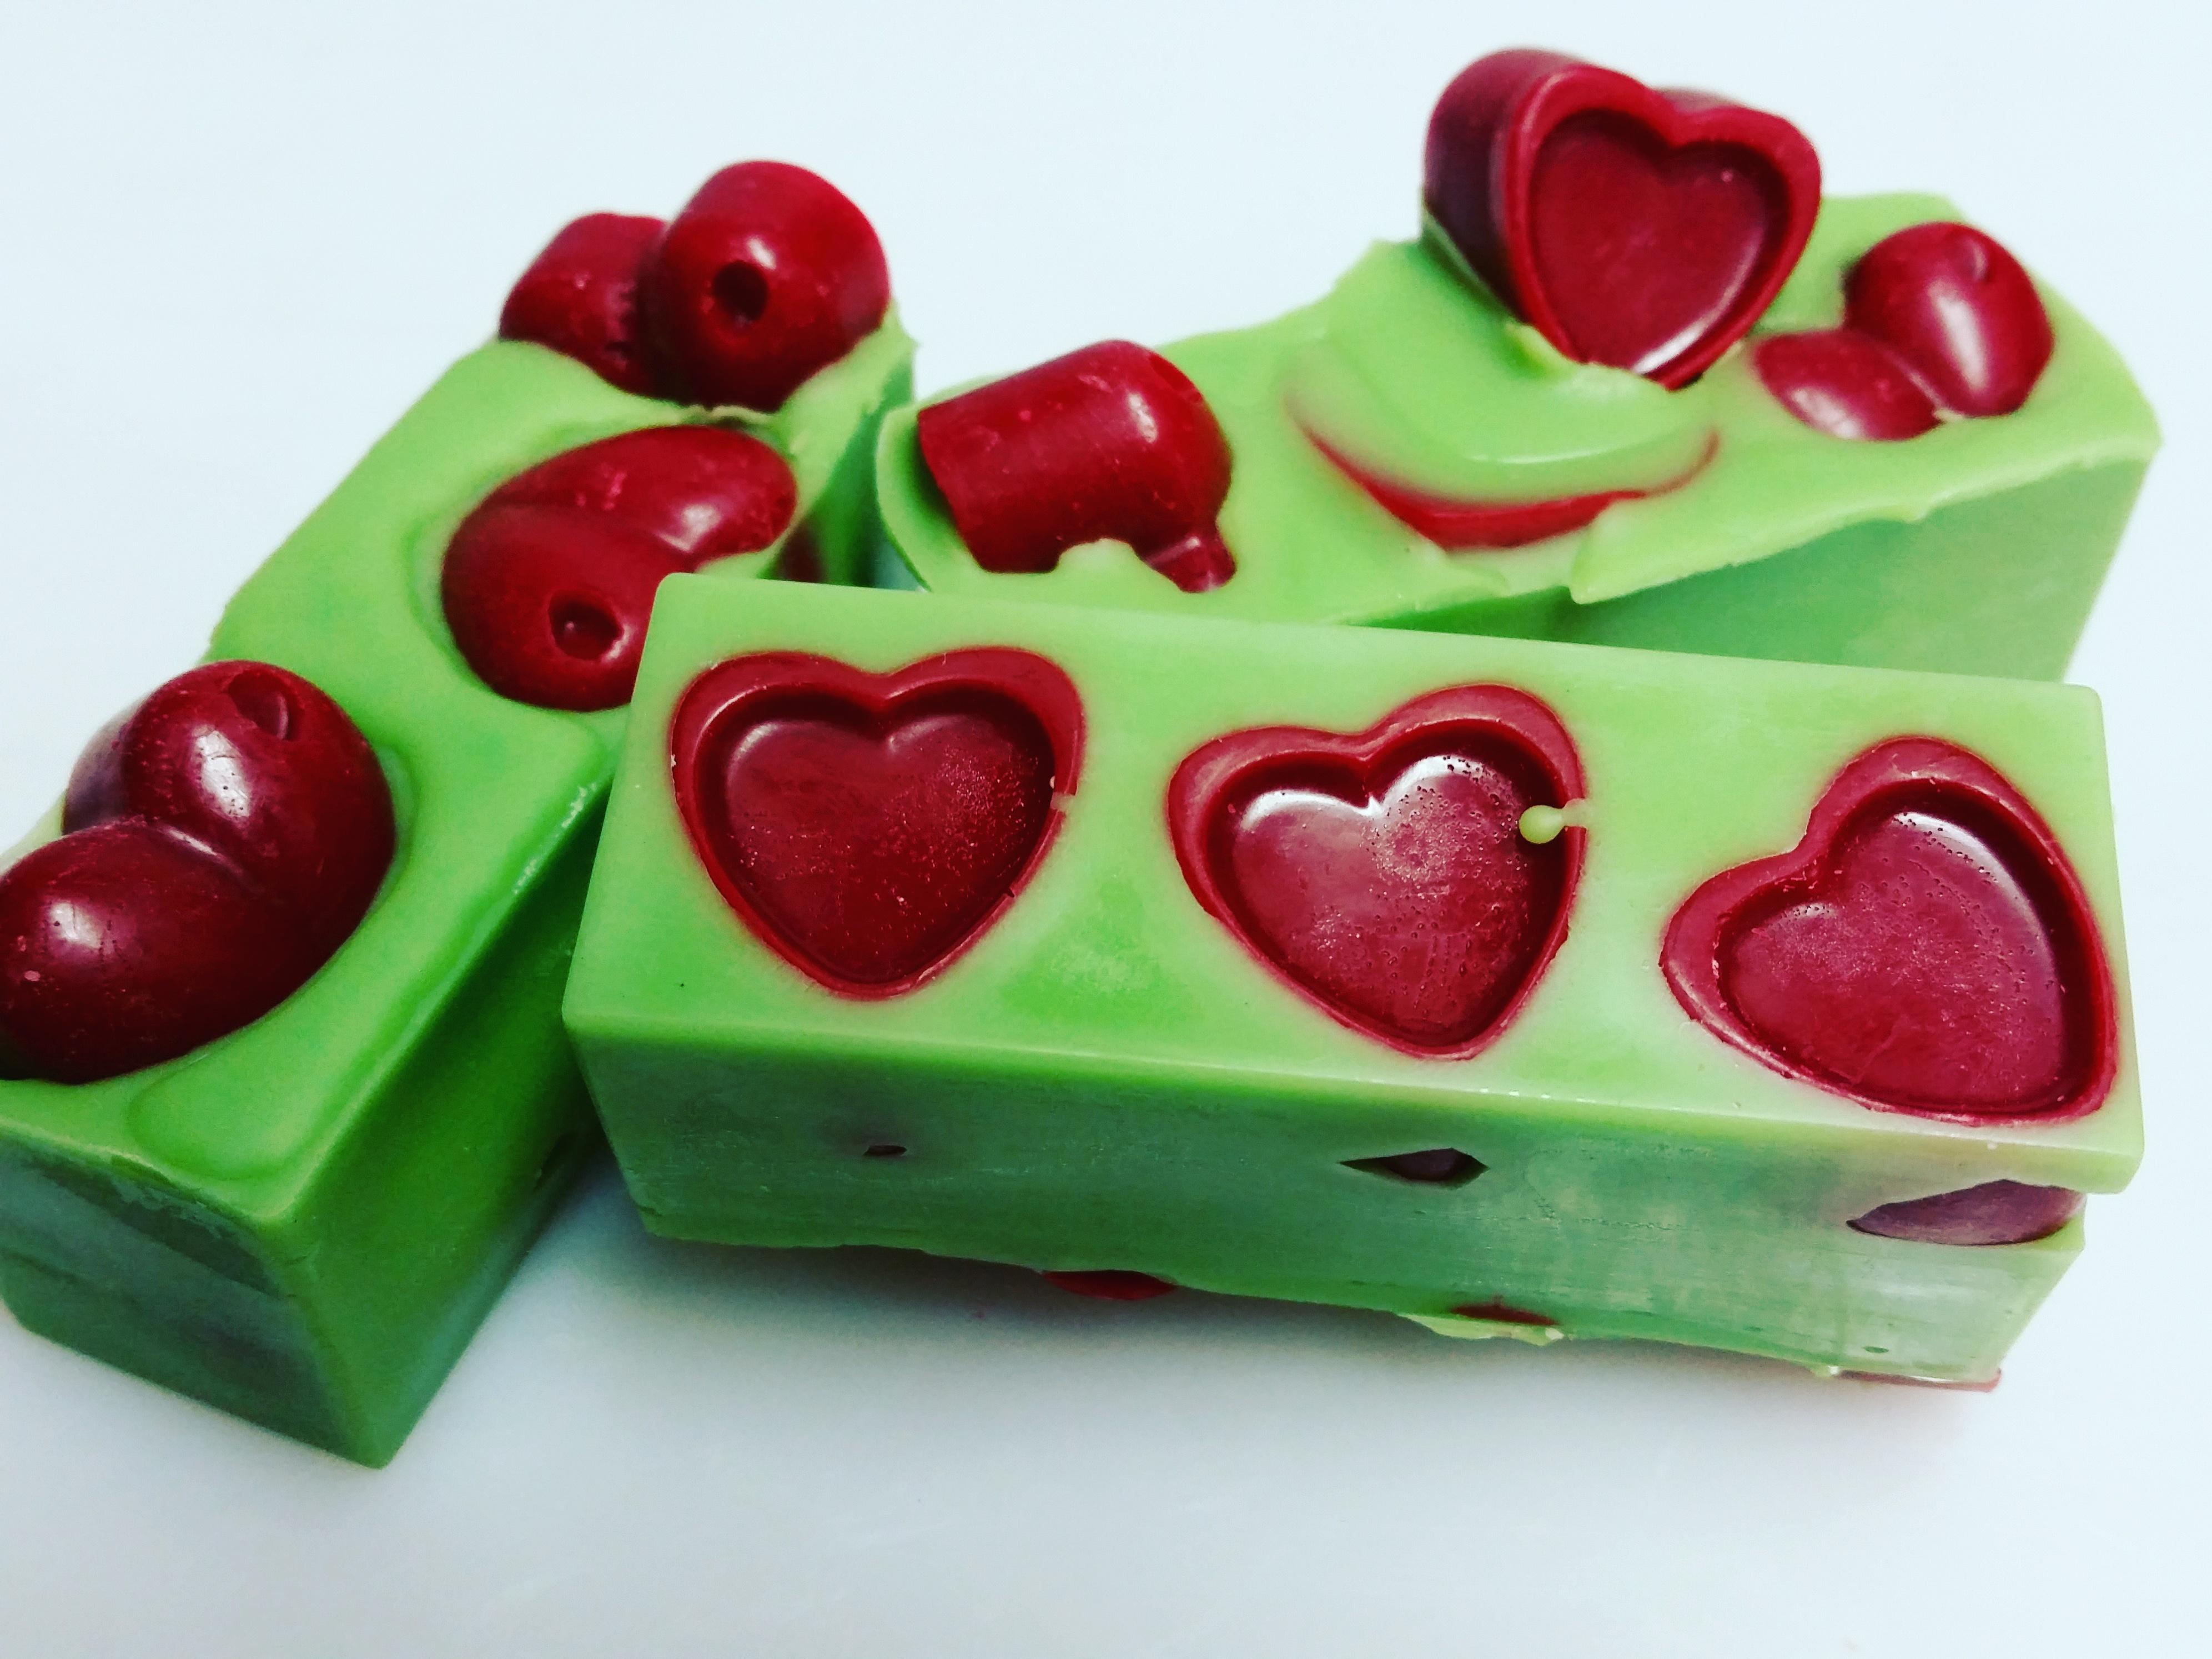 wax-cinn-bayberry-chunkbar